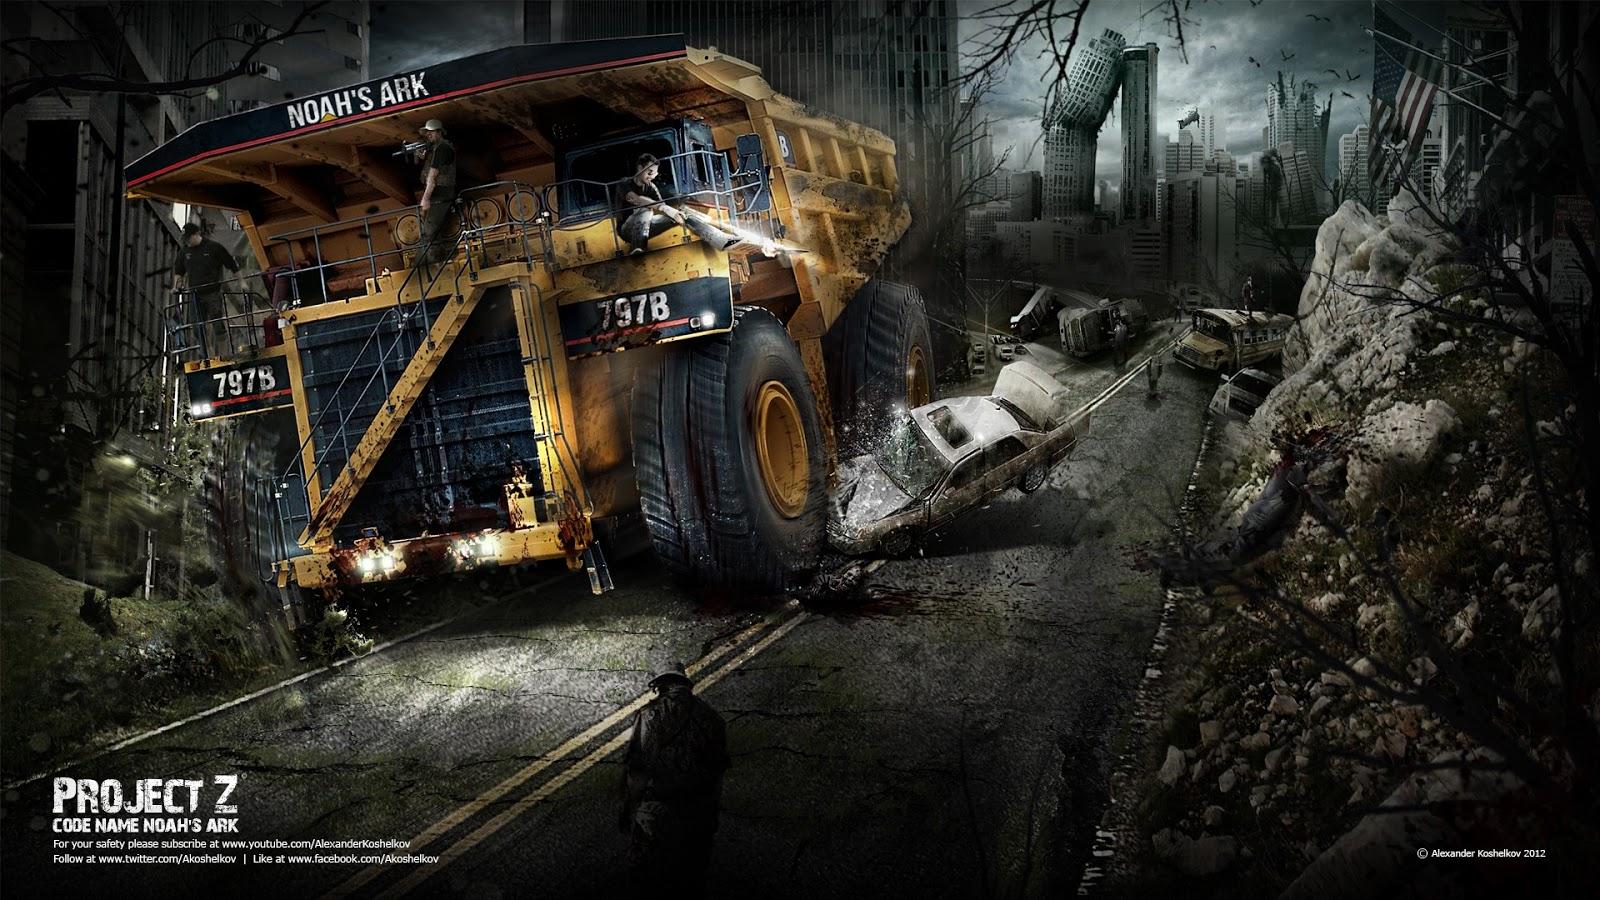 Zombie Apocalypse Wallpaper HD - WallpaperSafari